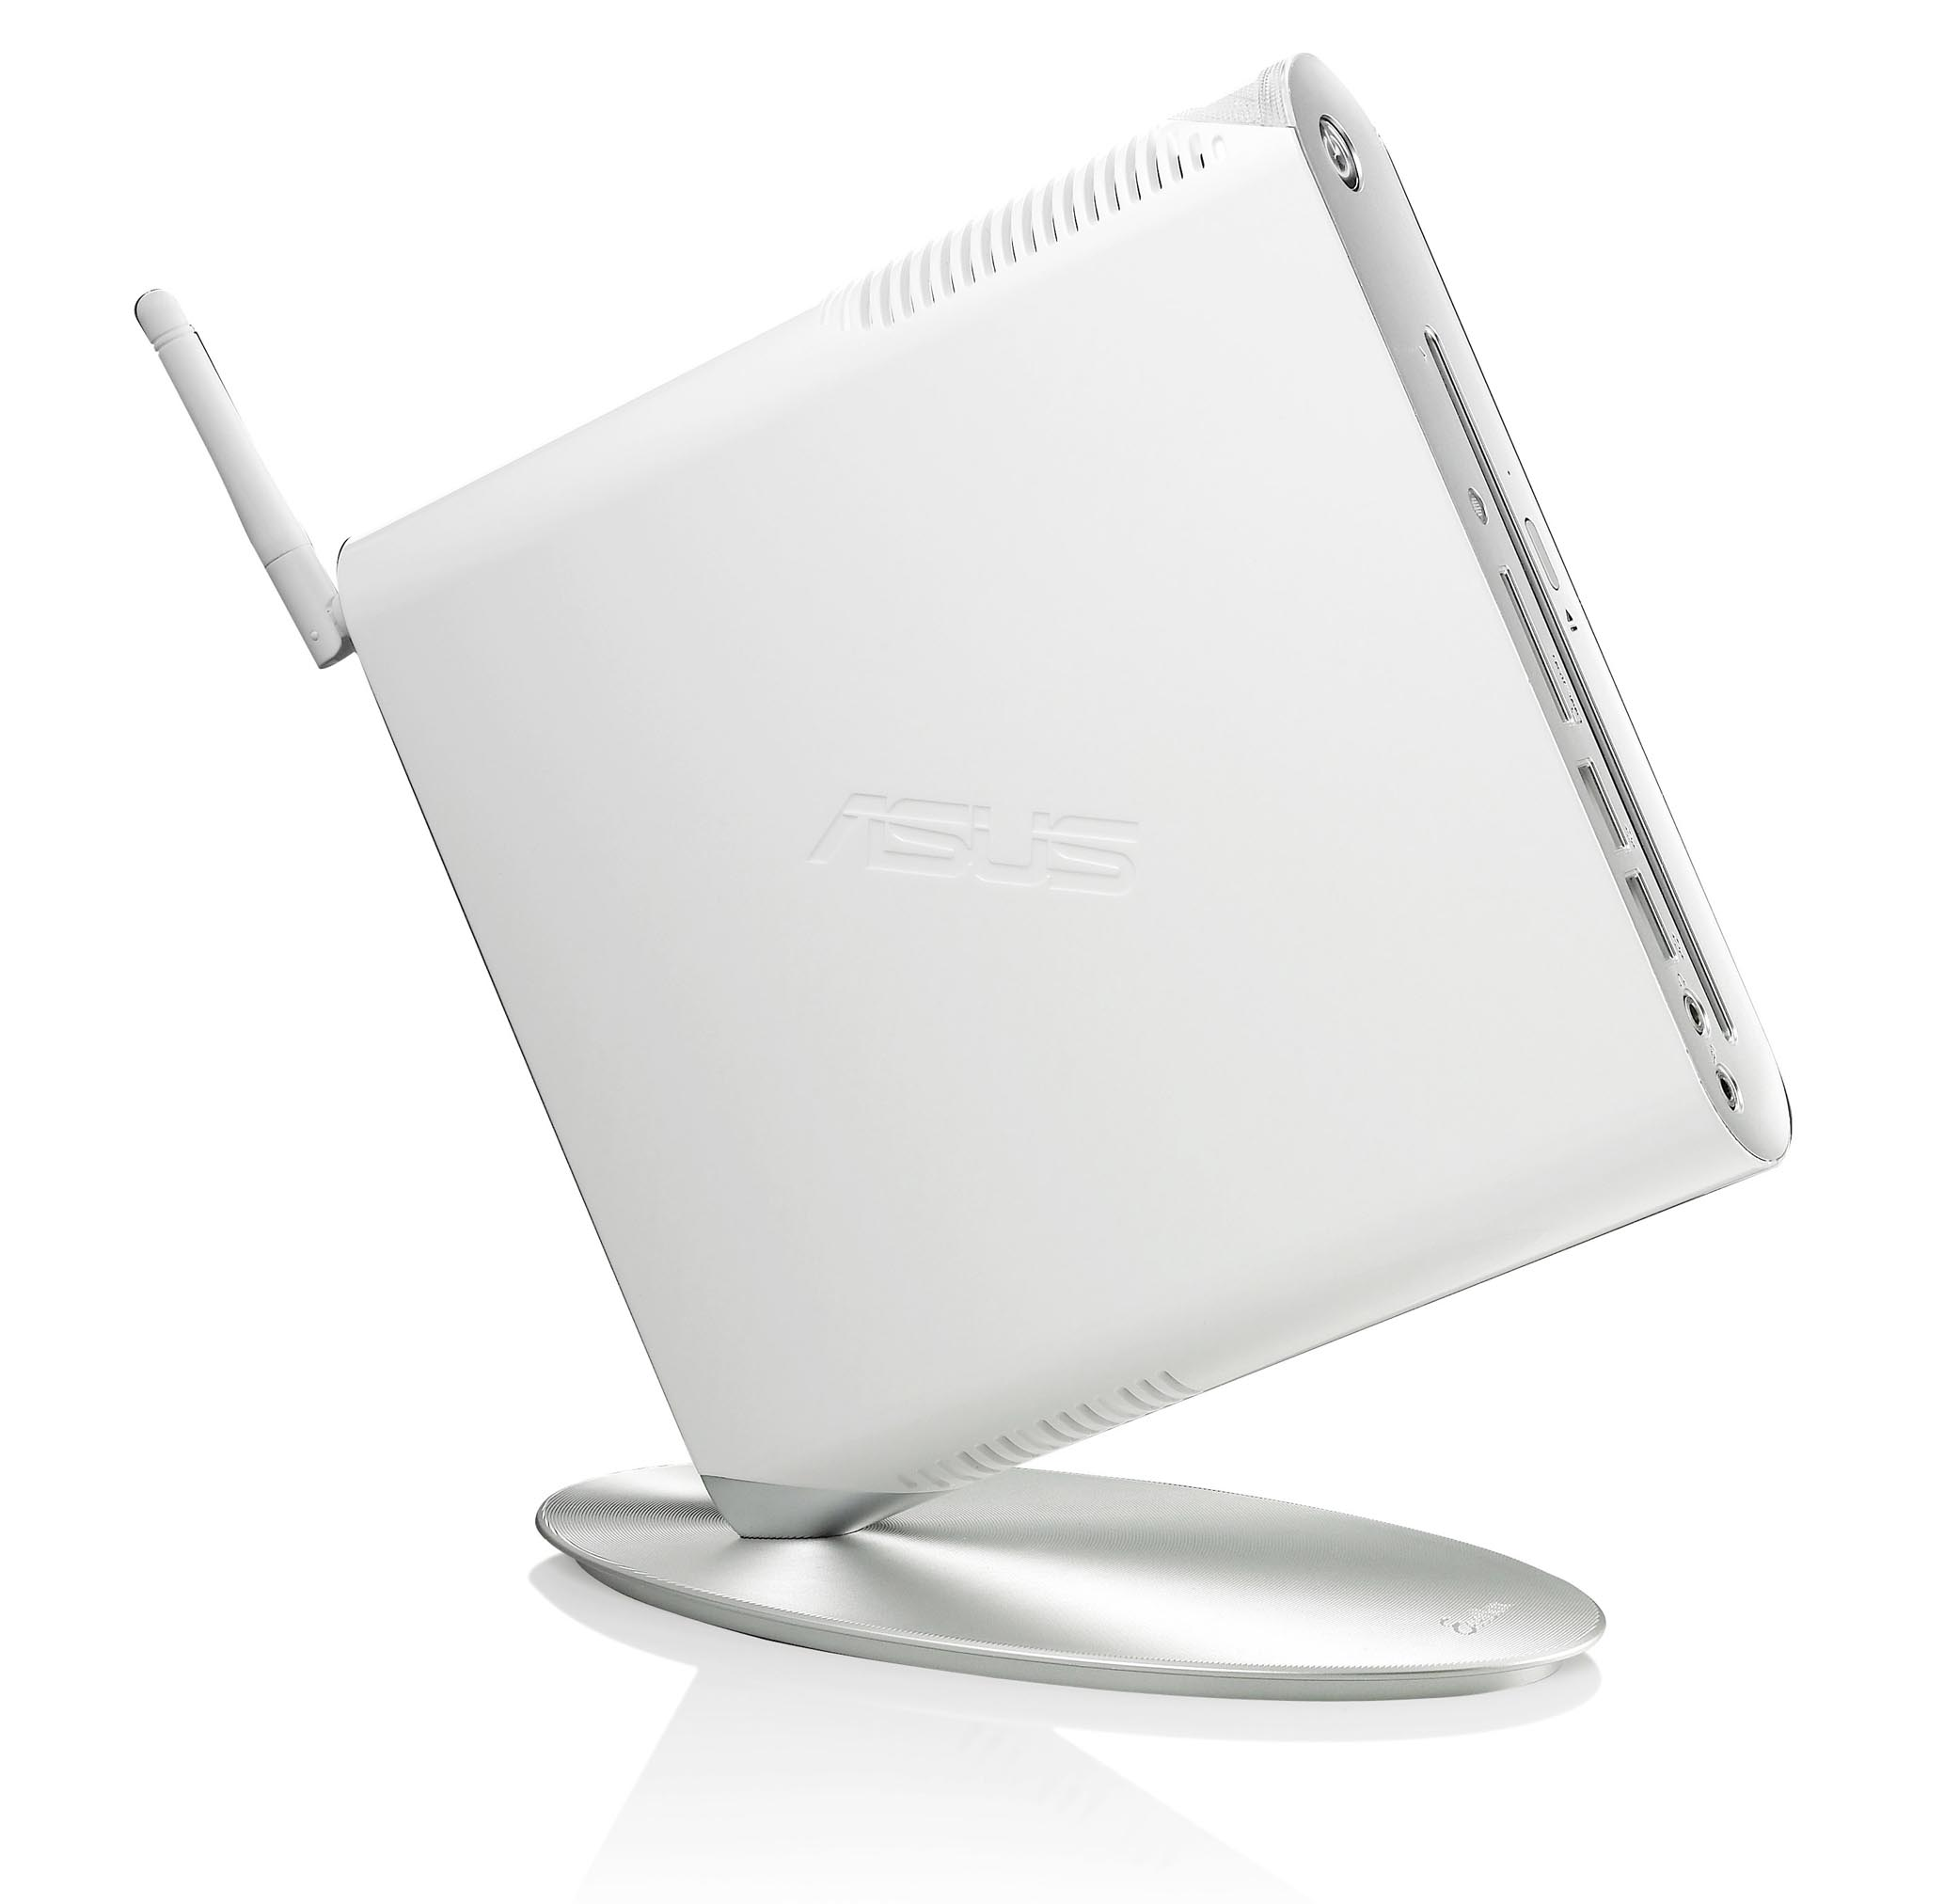 EeeBox 迷你電腦 / 華碩電腦股份有限公司